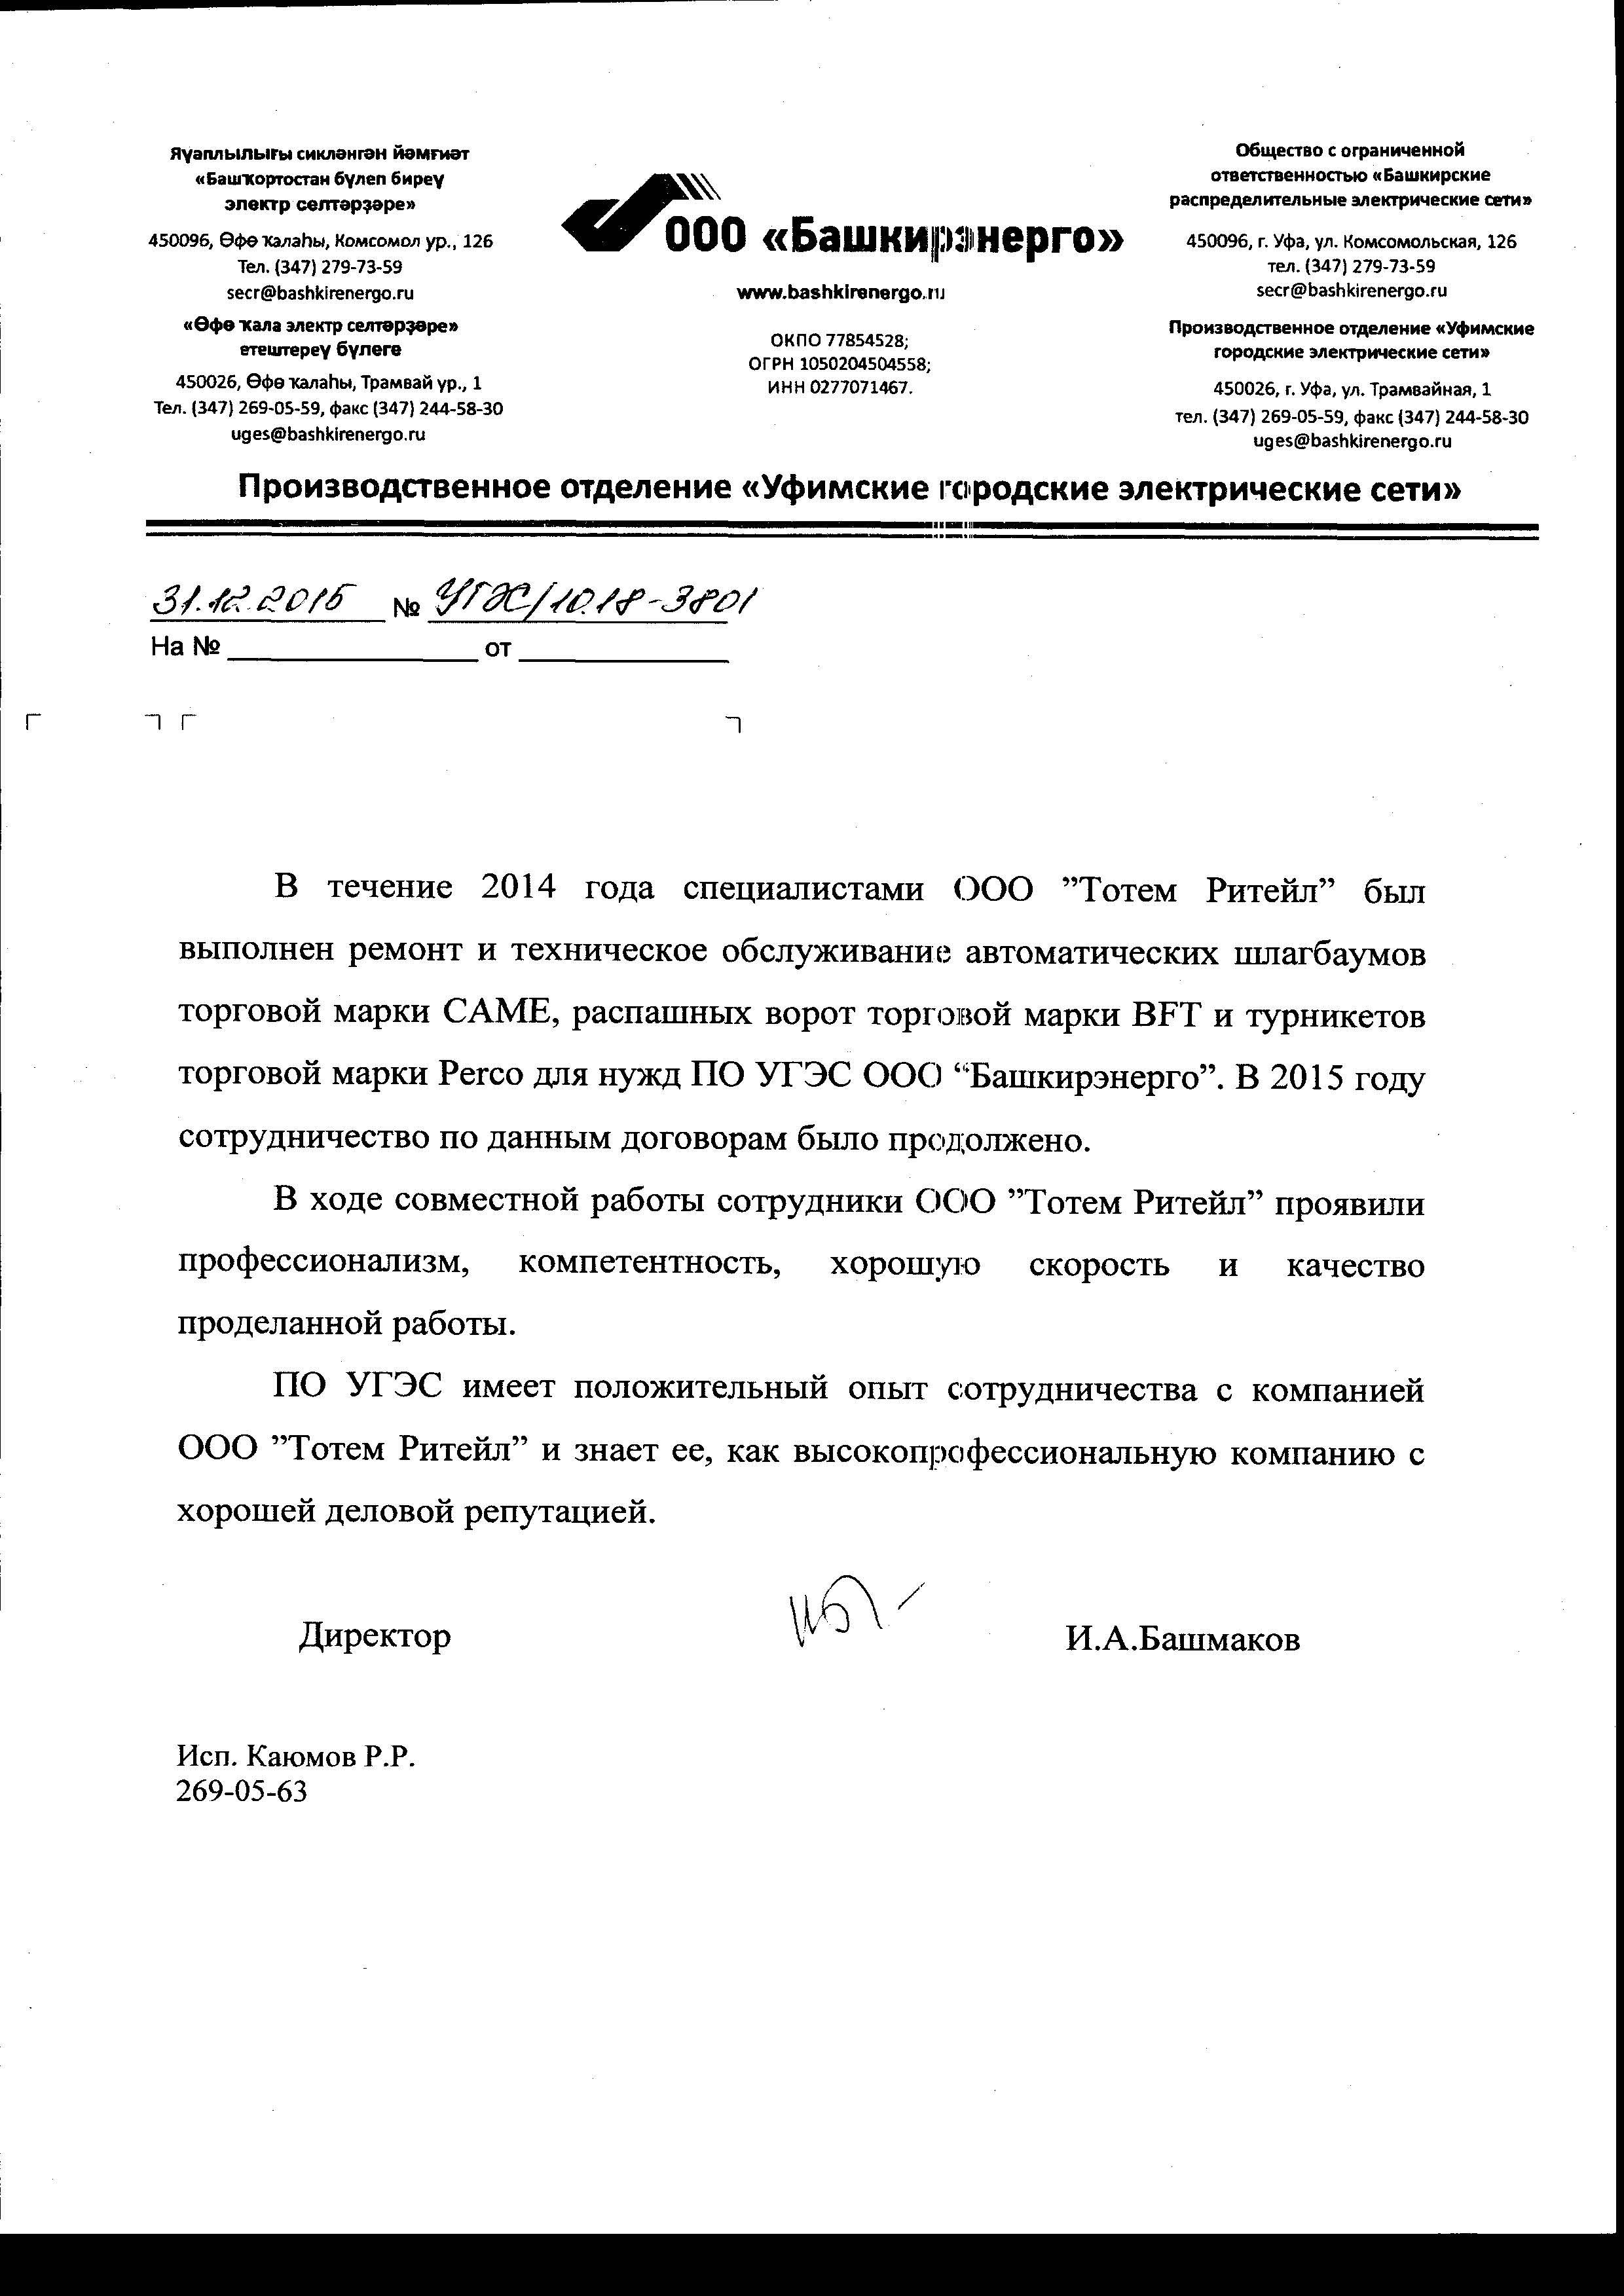 Рекомендашка_УГЭС.jpg